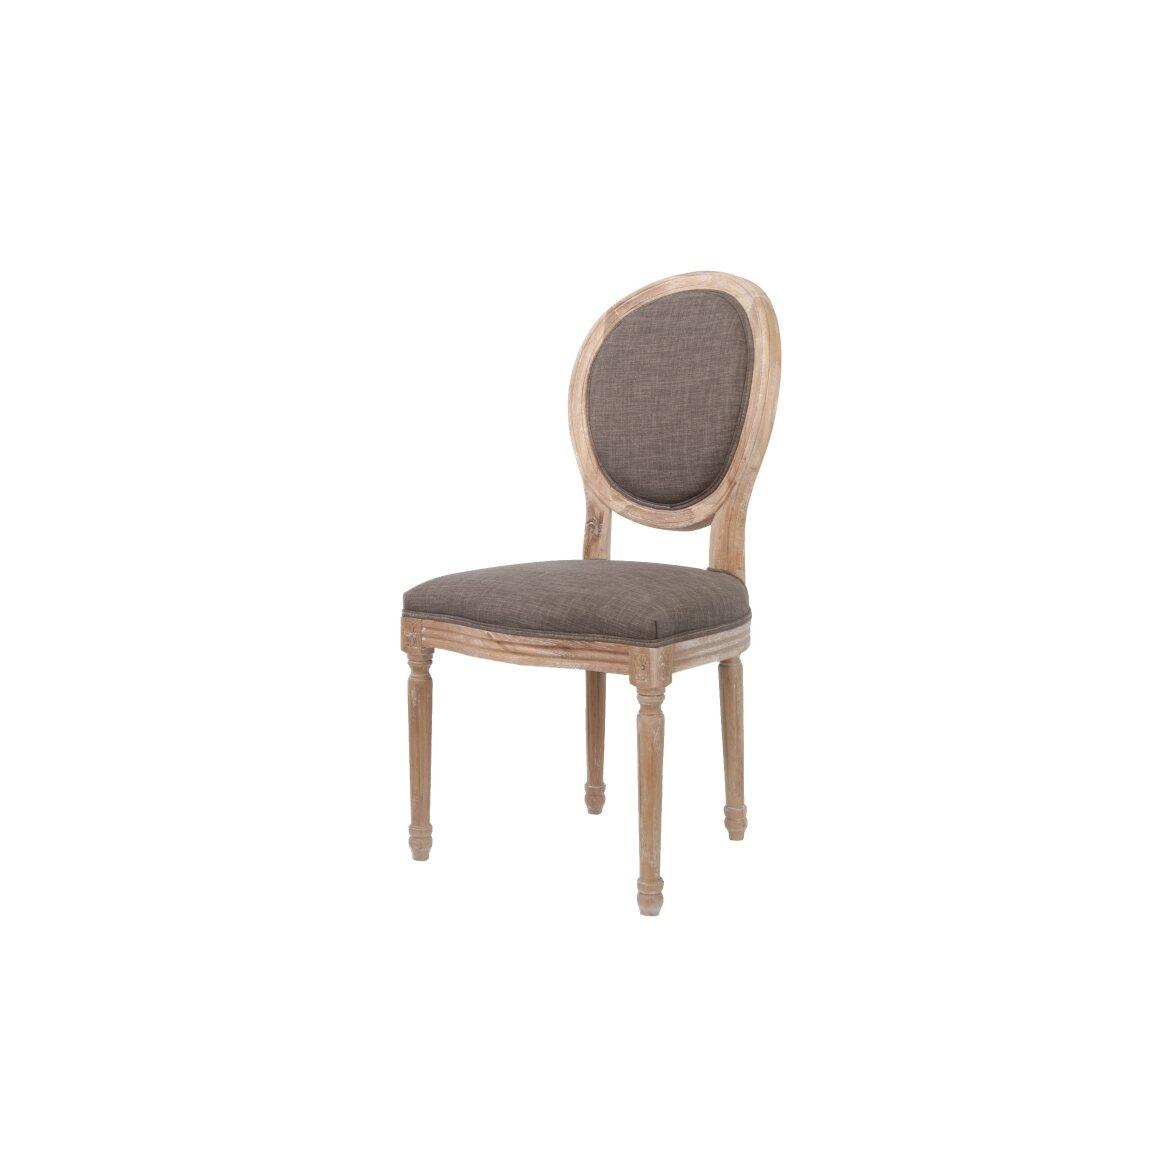 Стул Miro brown 4 | Обеденные стулья Kingsby